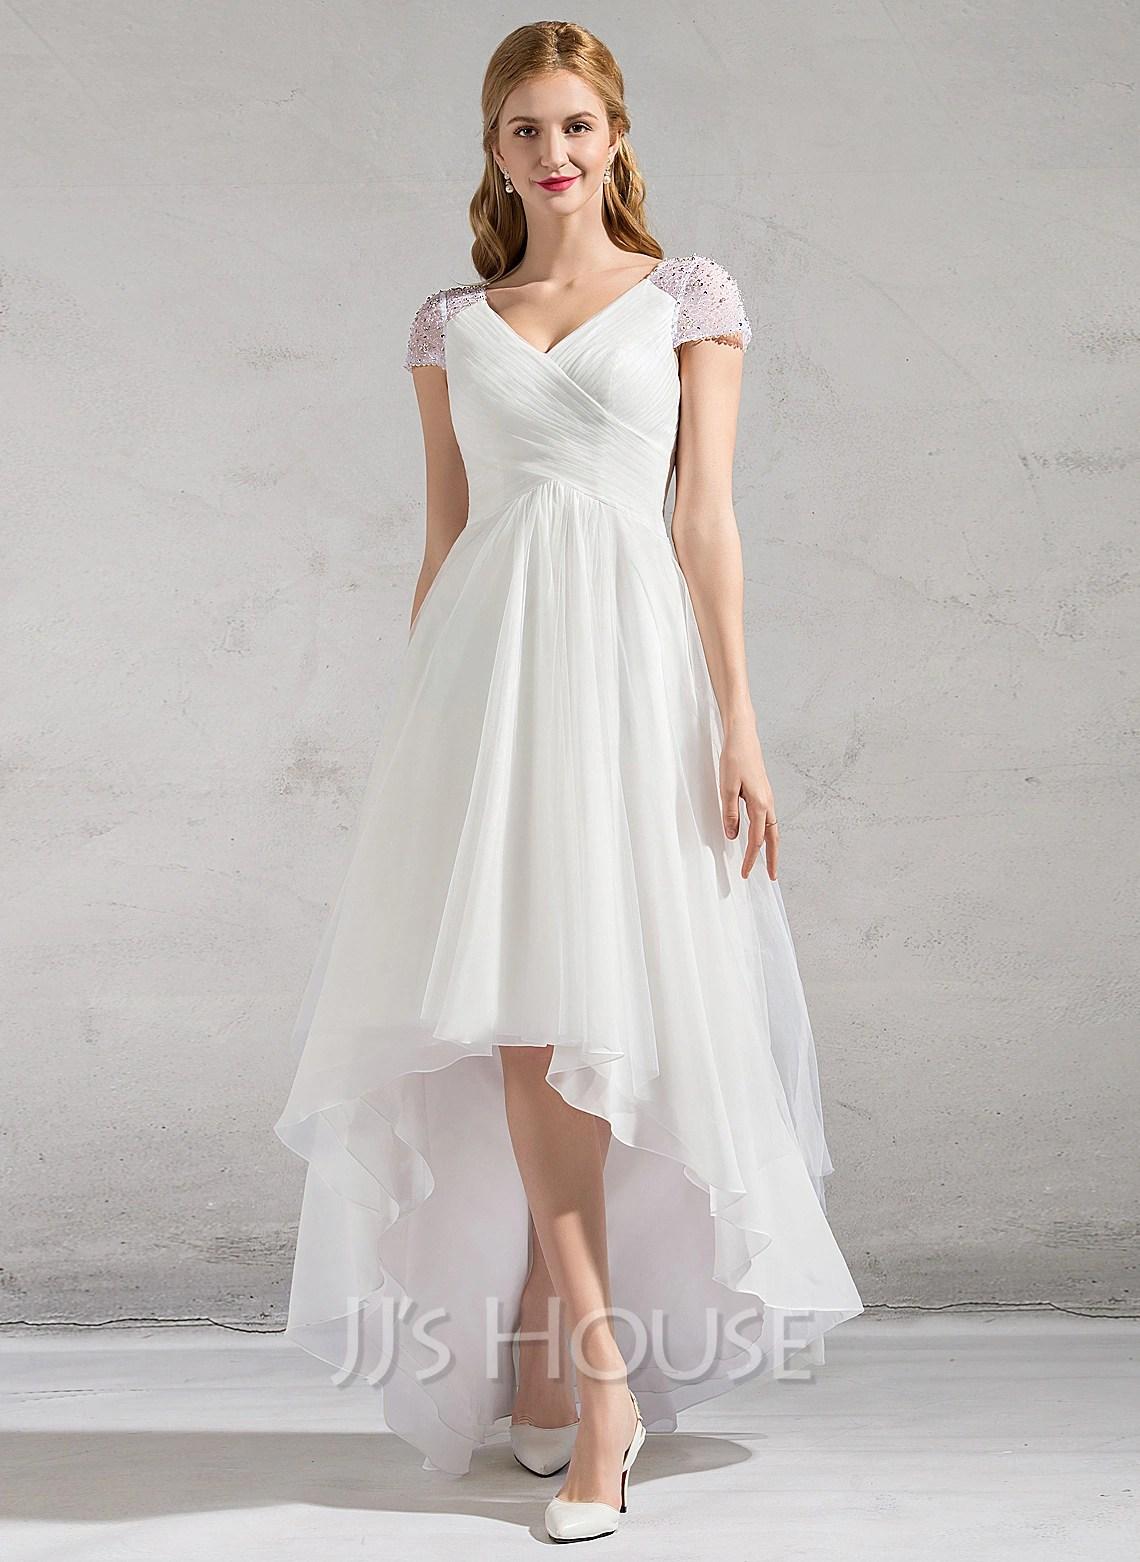 A Line Princess V Neck Asymmetrical Tulle Wedding Dress With Ruffle Beading Sequins g jjshouse wedding dress Home Wedding Dresses Loading zoom